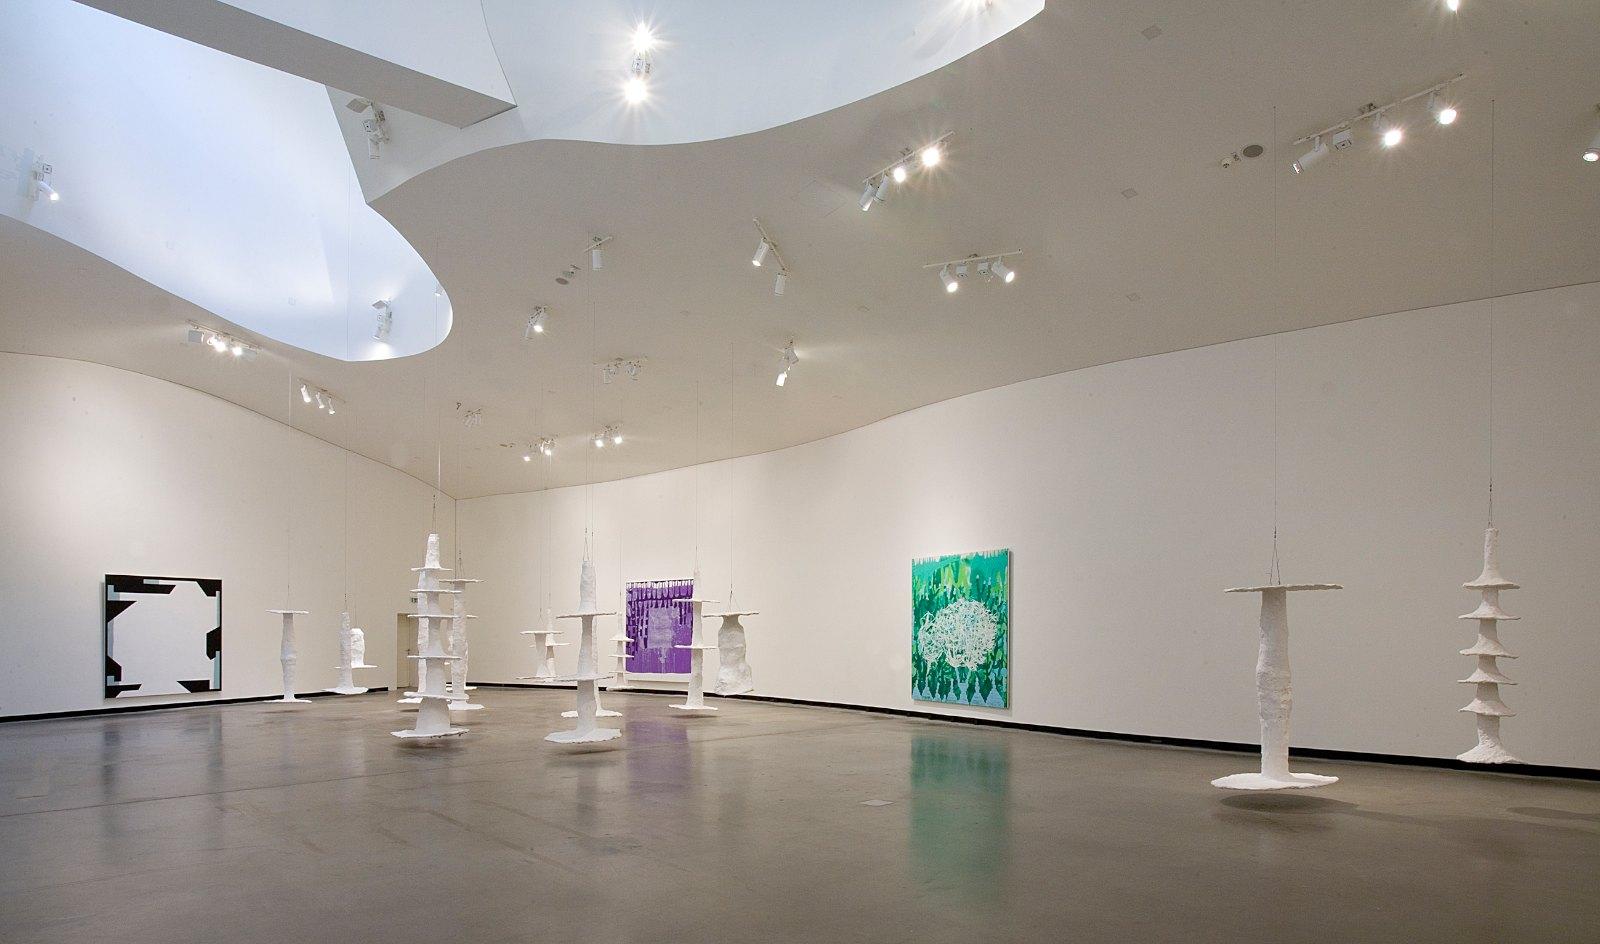 Installation view Olav Christopher Jenssen, Enigma – Works 1985–2012, Marta Herford, Herford, Germany, 2013. Photo: Hans Schröder / Marta Herford